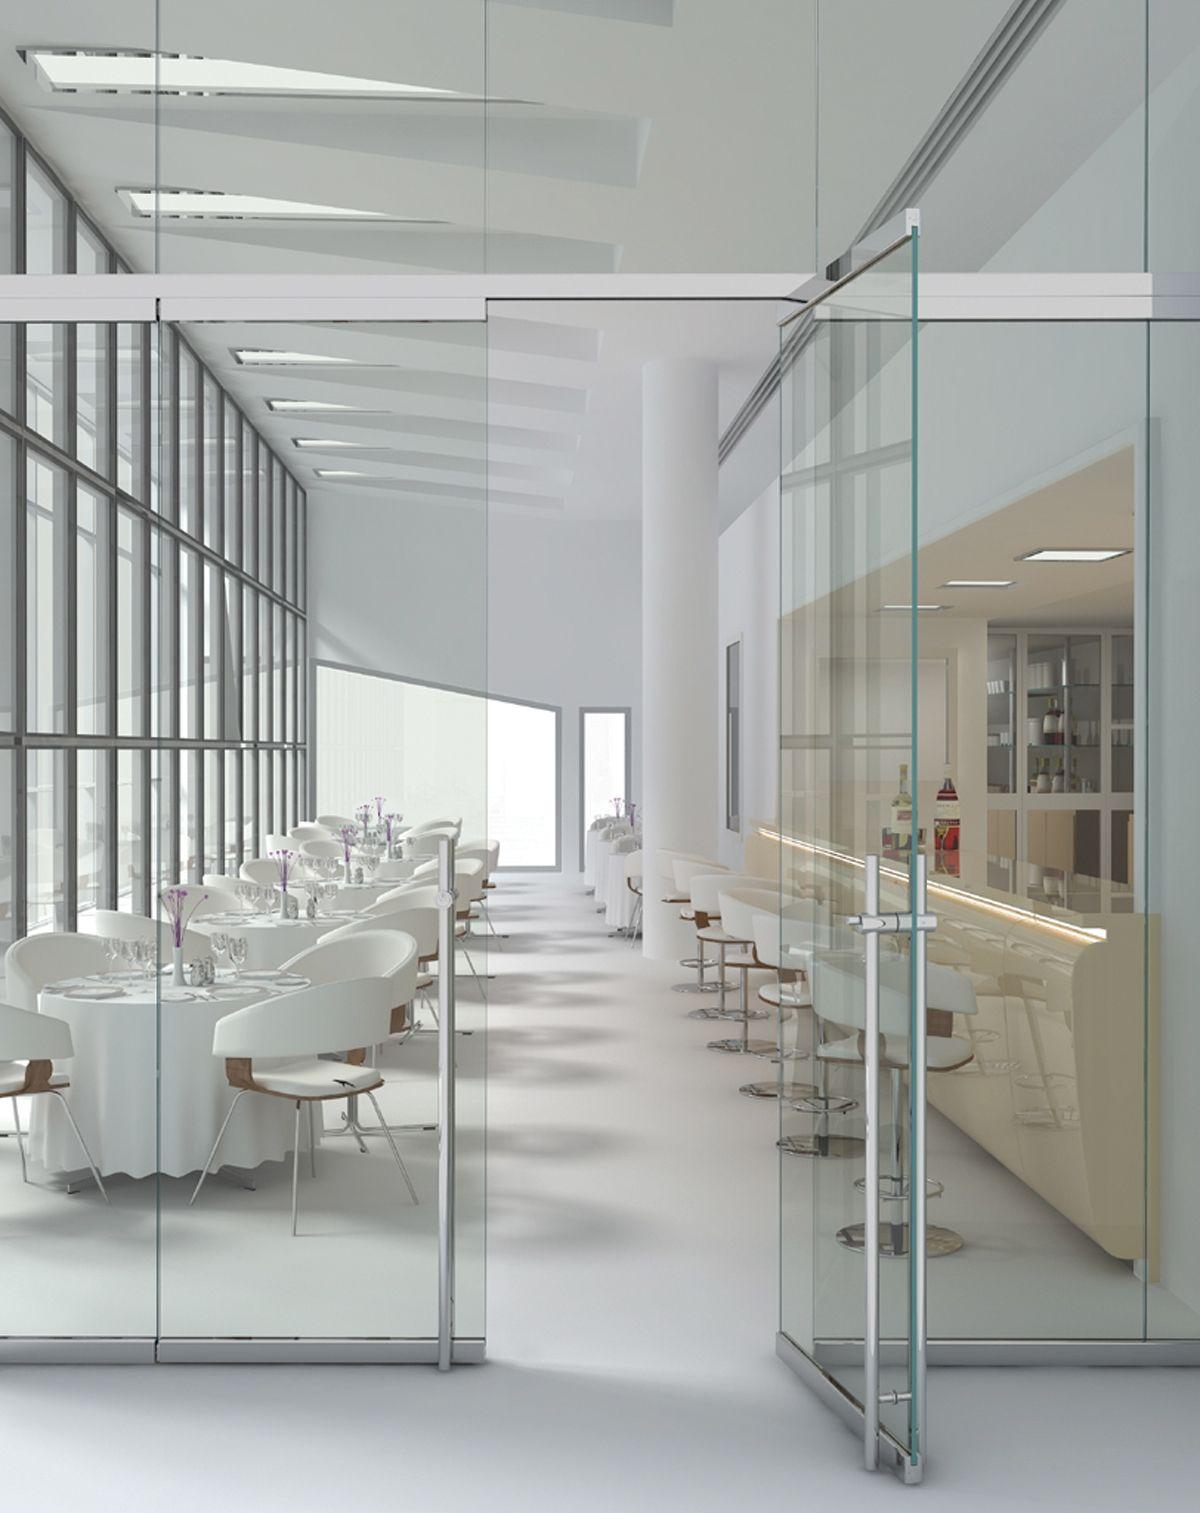 Frameless glass door details google search bars restaurants frameless glass door details google search eventelaan Gallery